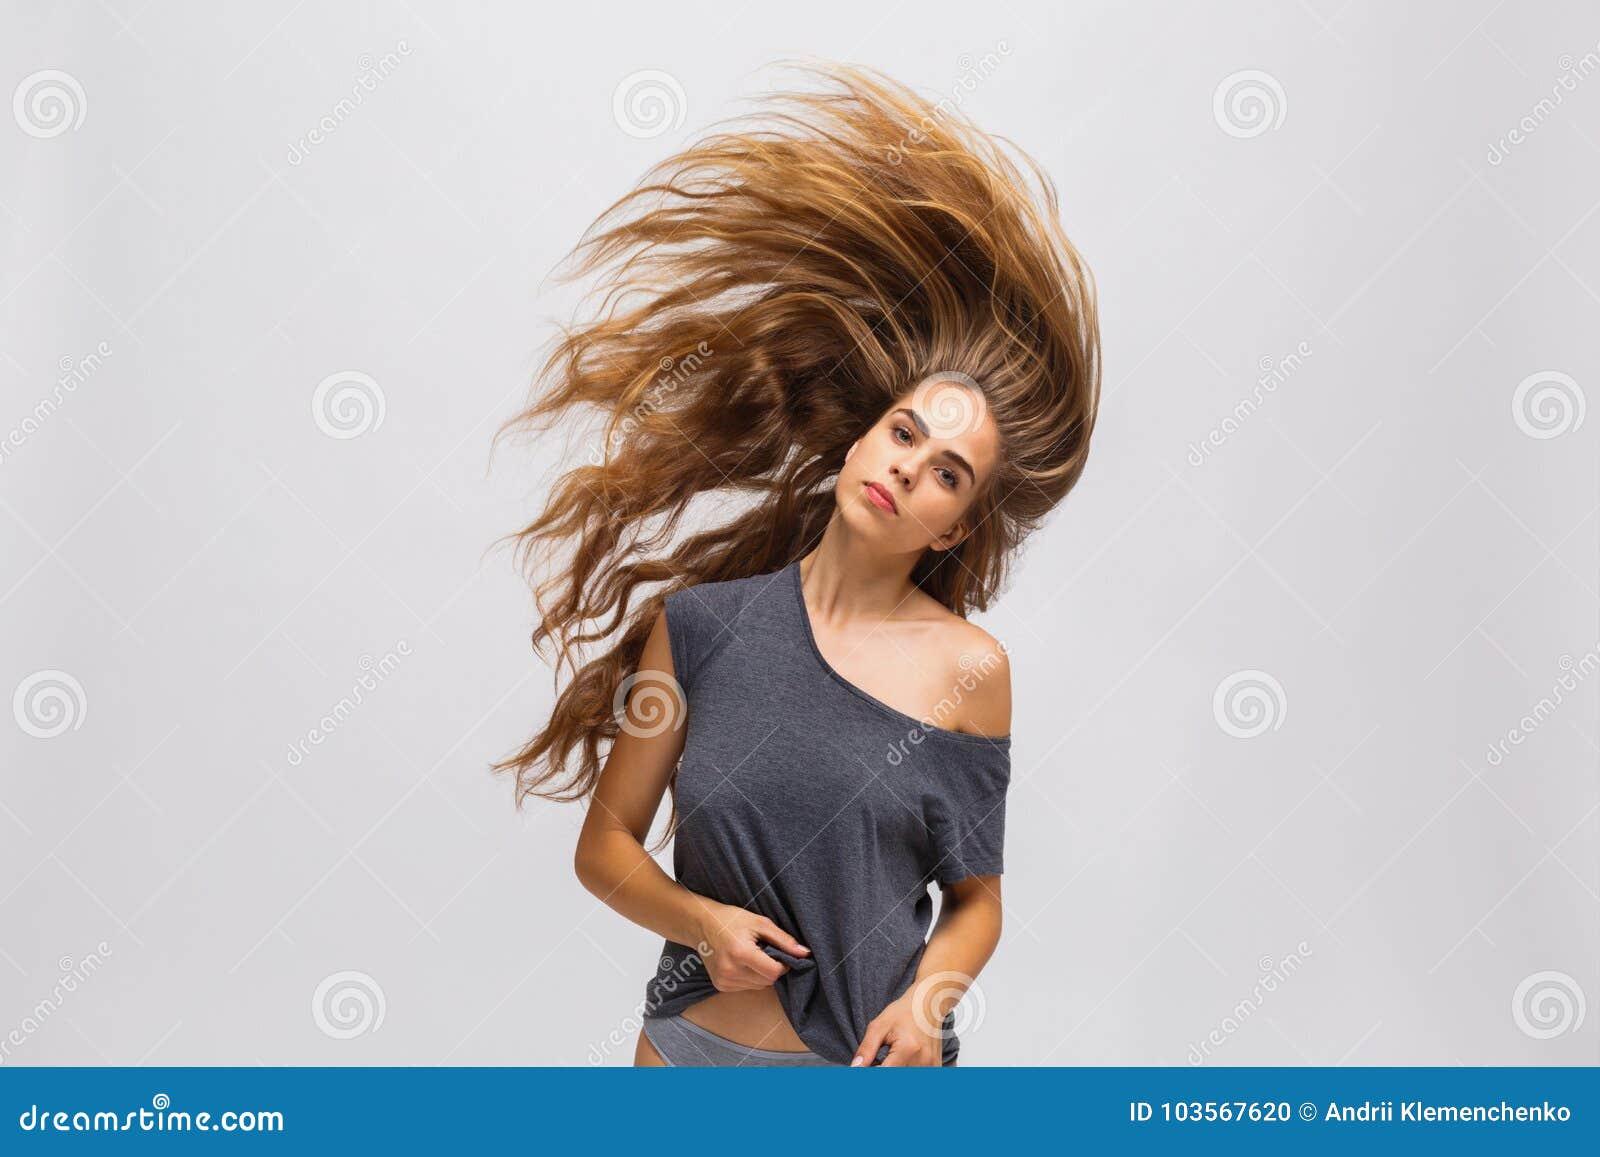 background hot girl